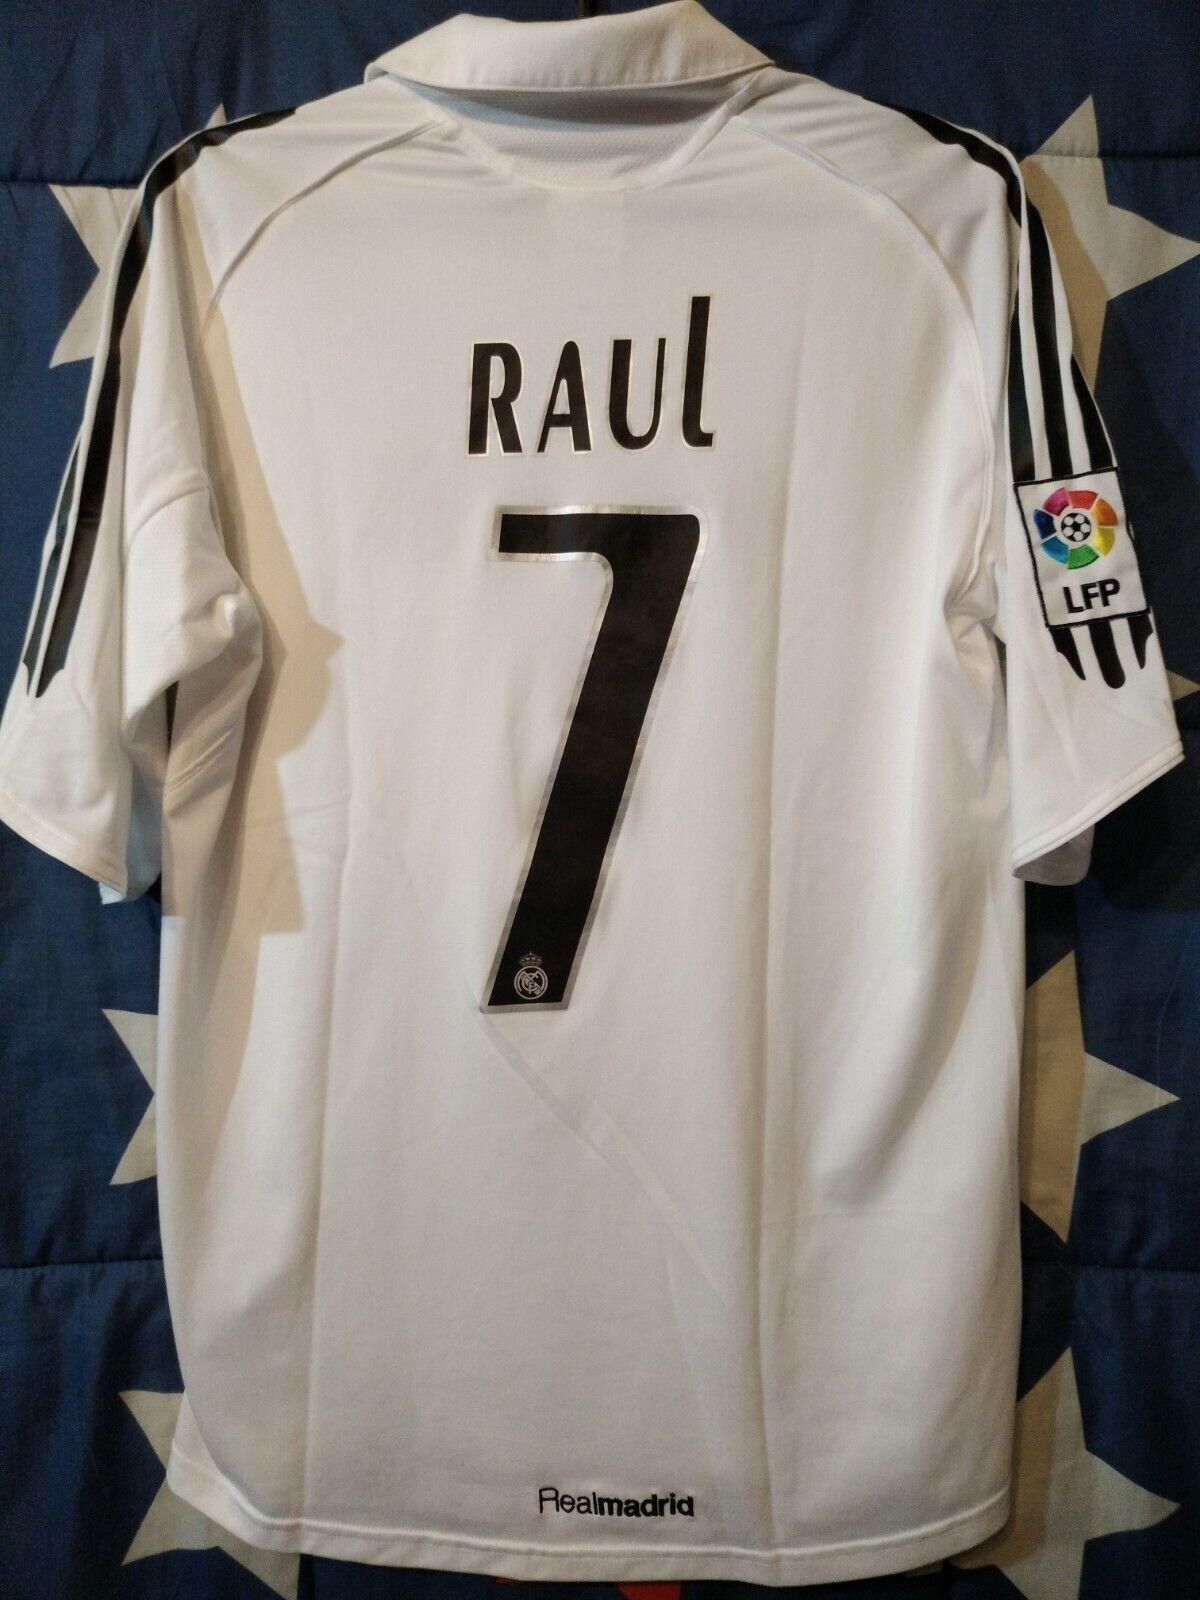 Größe S Real Madrid Spain 2005-2006 HOME FOOTBALL SHIRT JERSEY RAUL  7